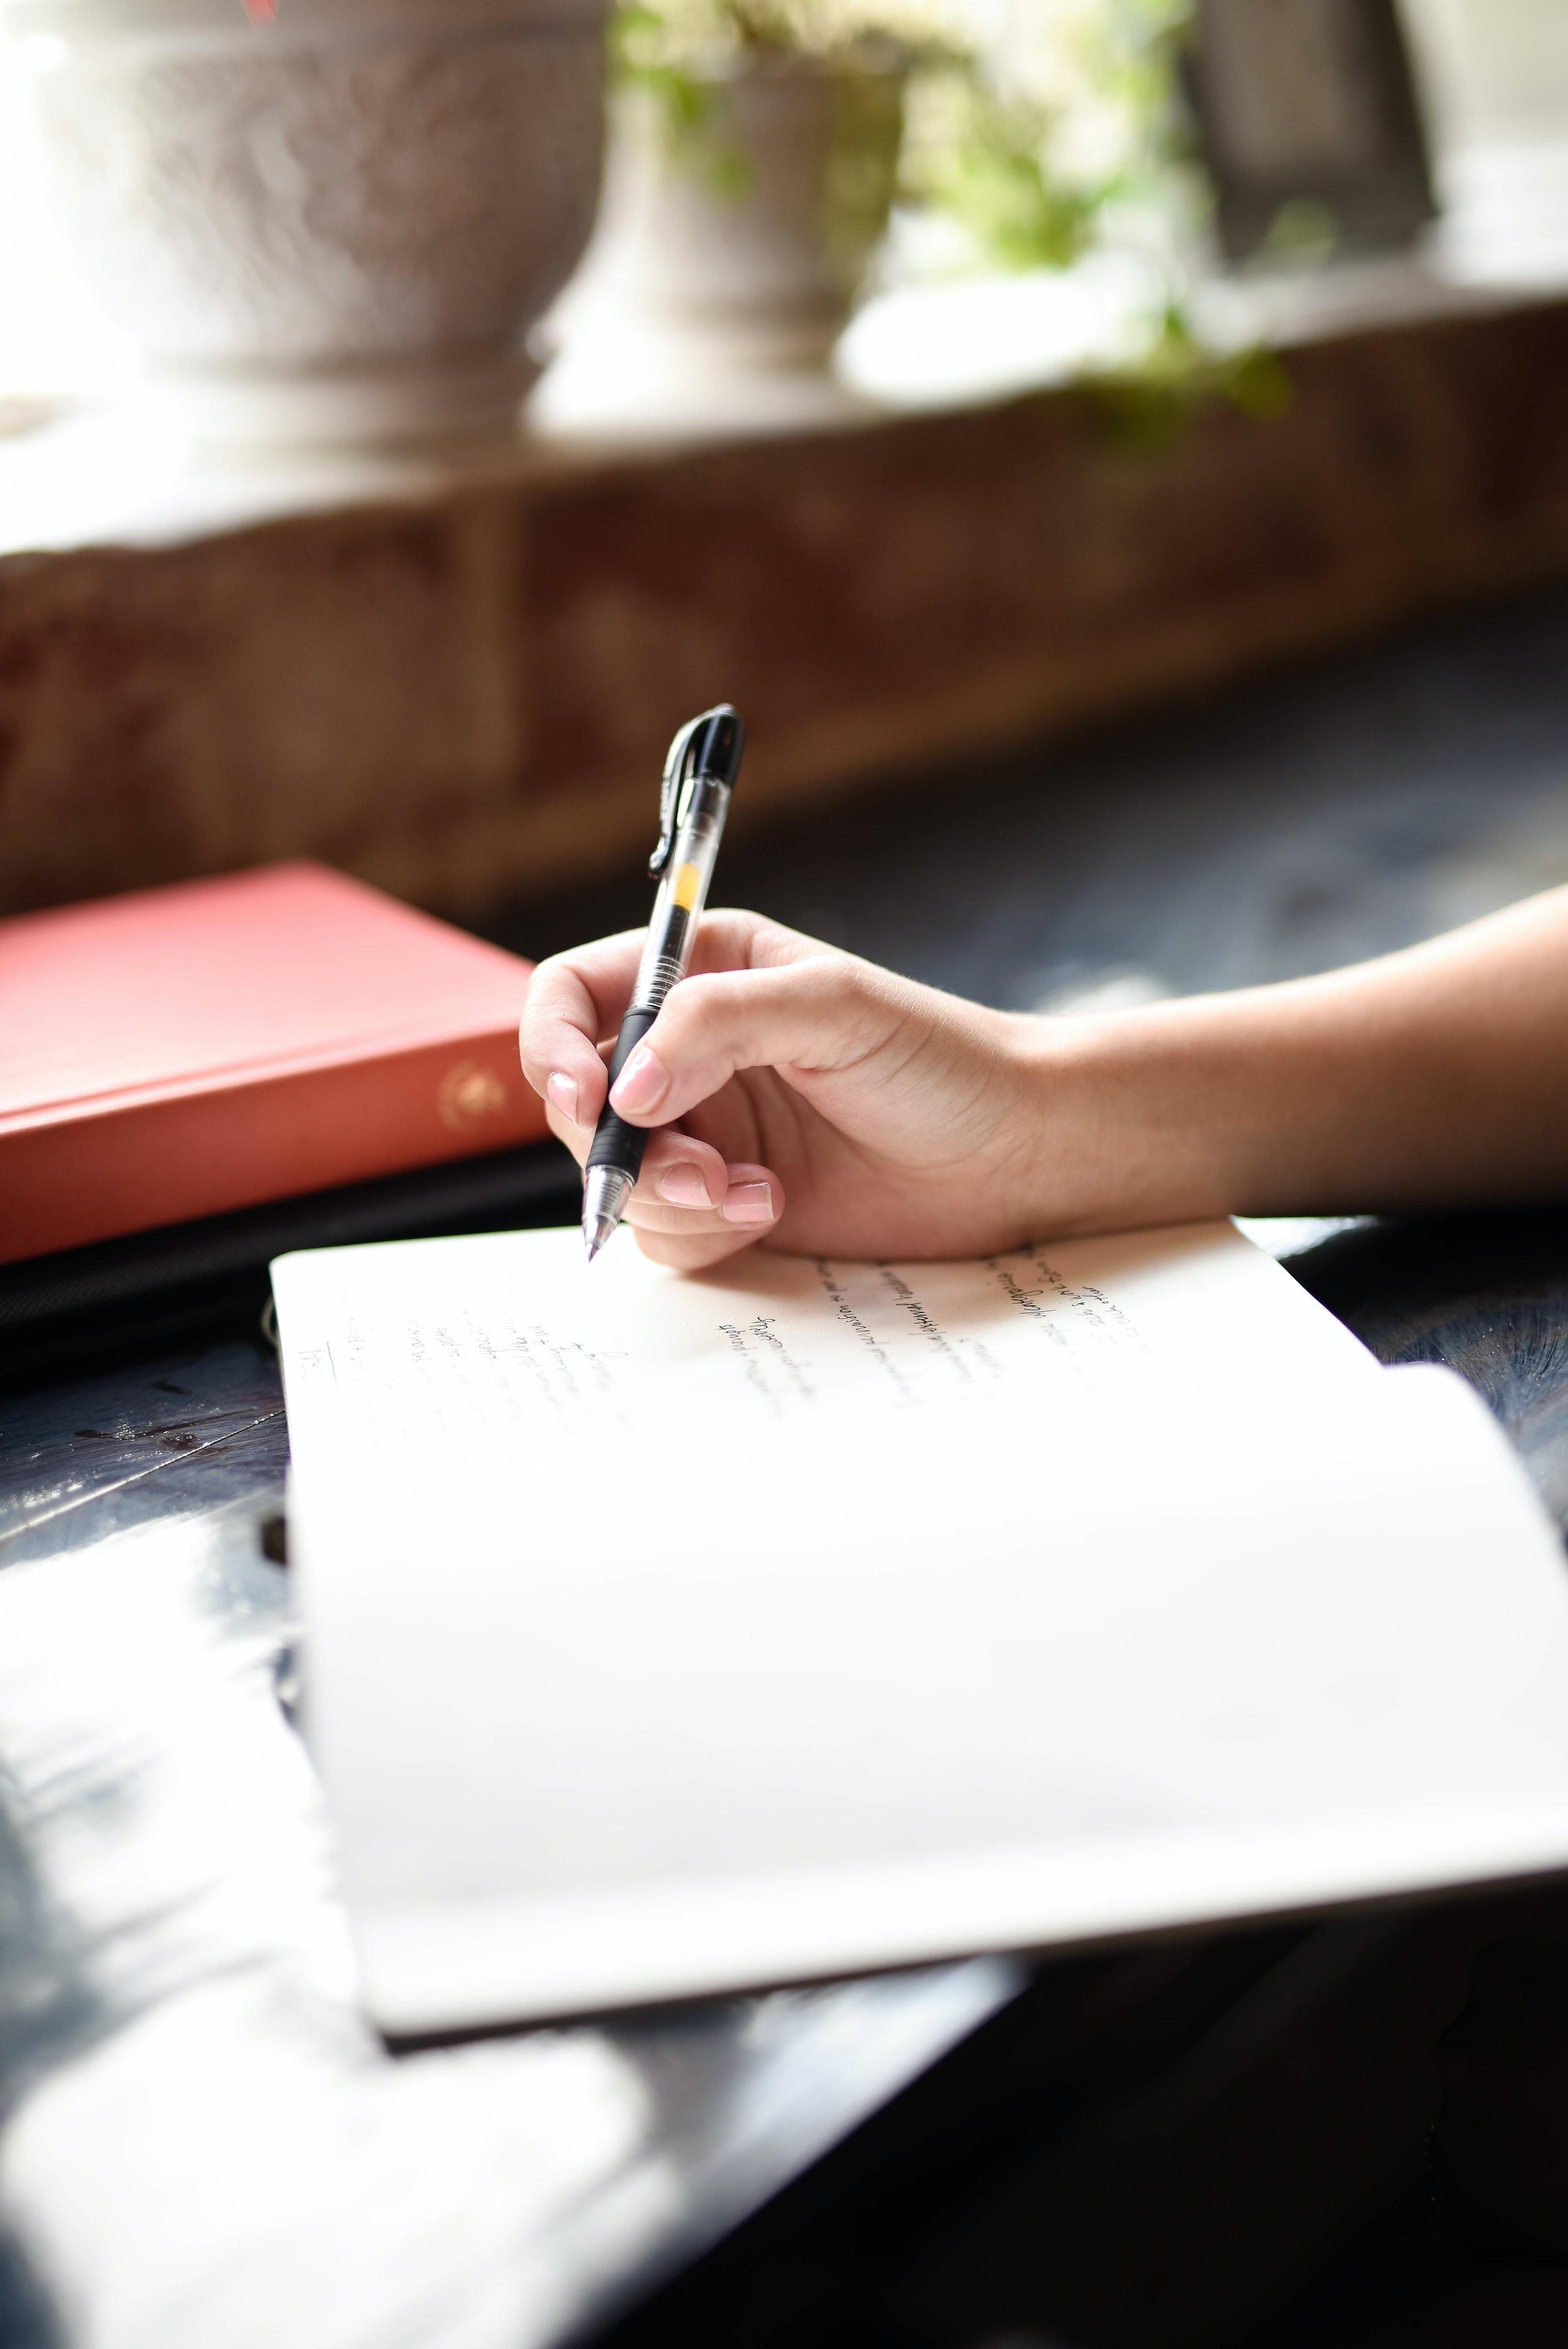 Image result for unsplash photo teacher student writing